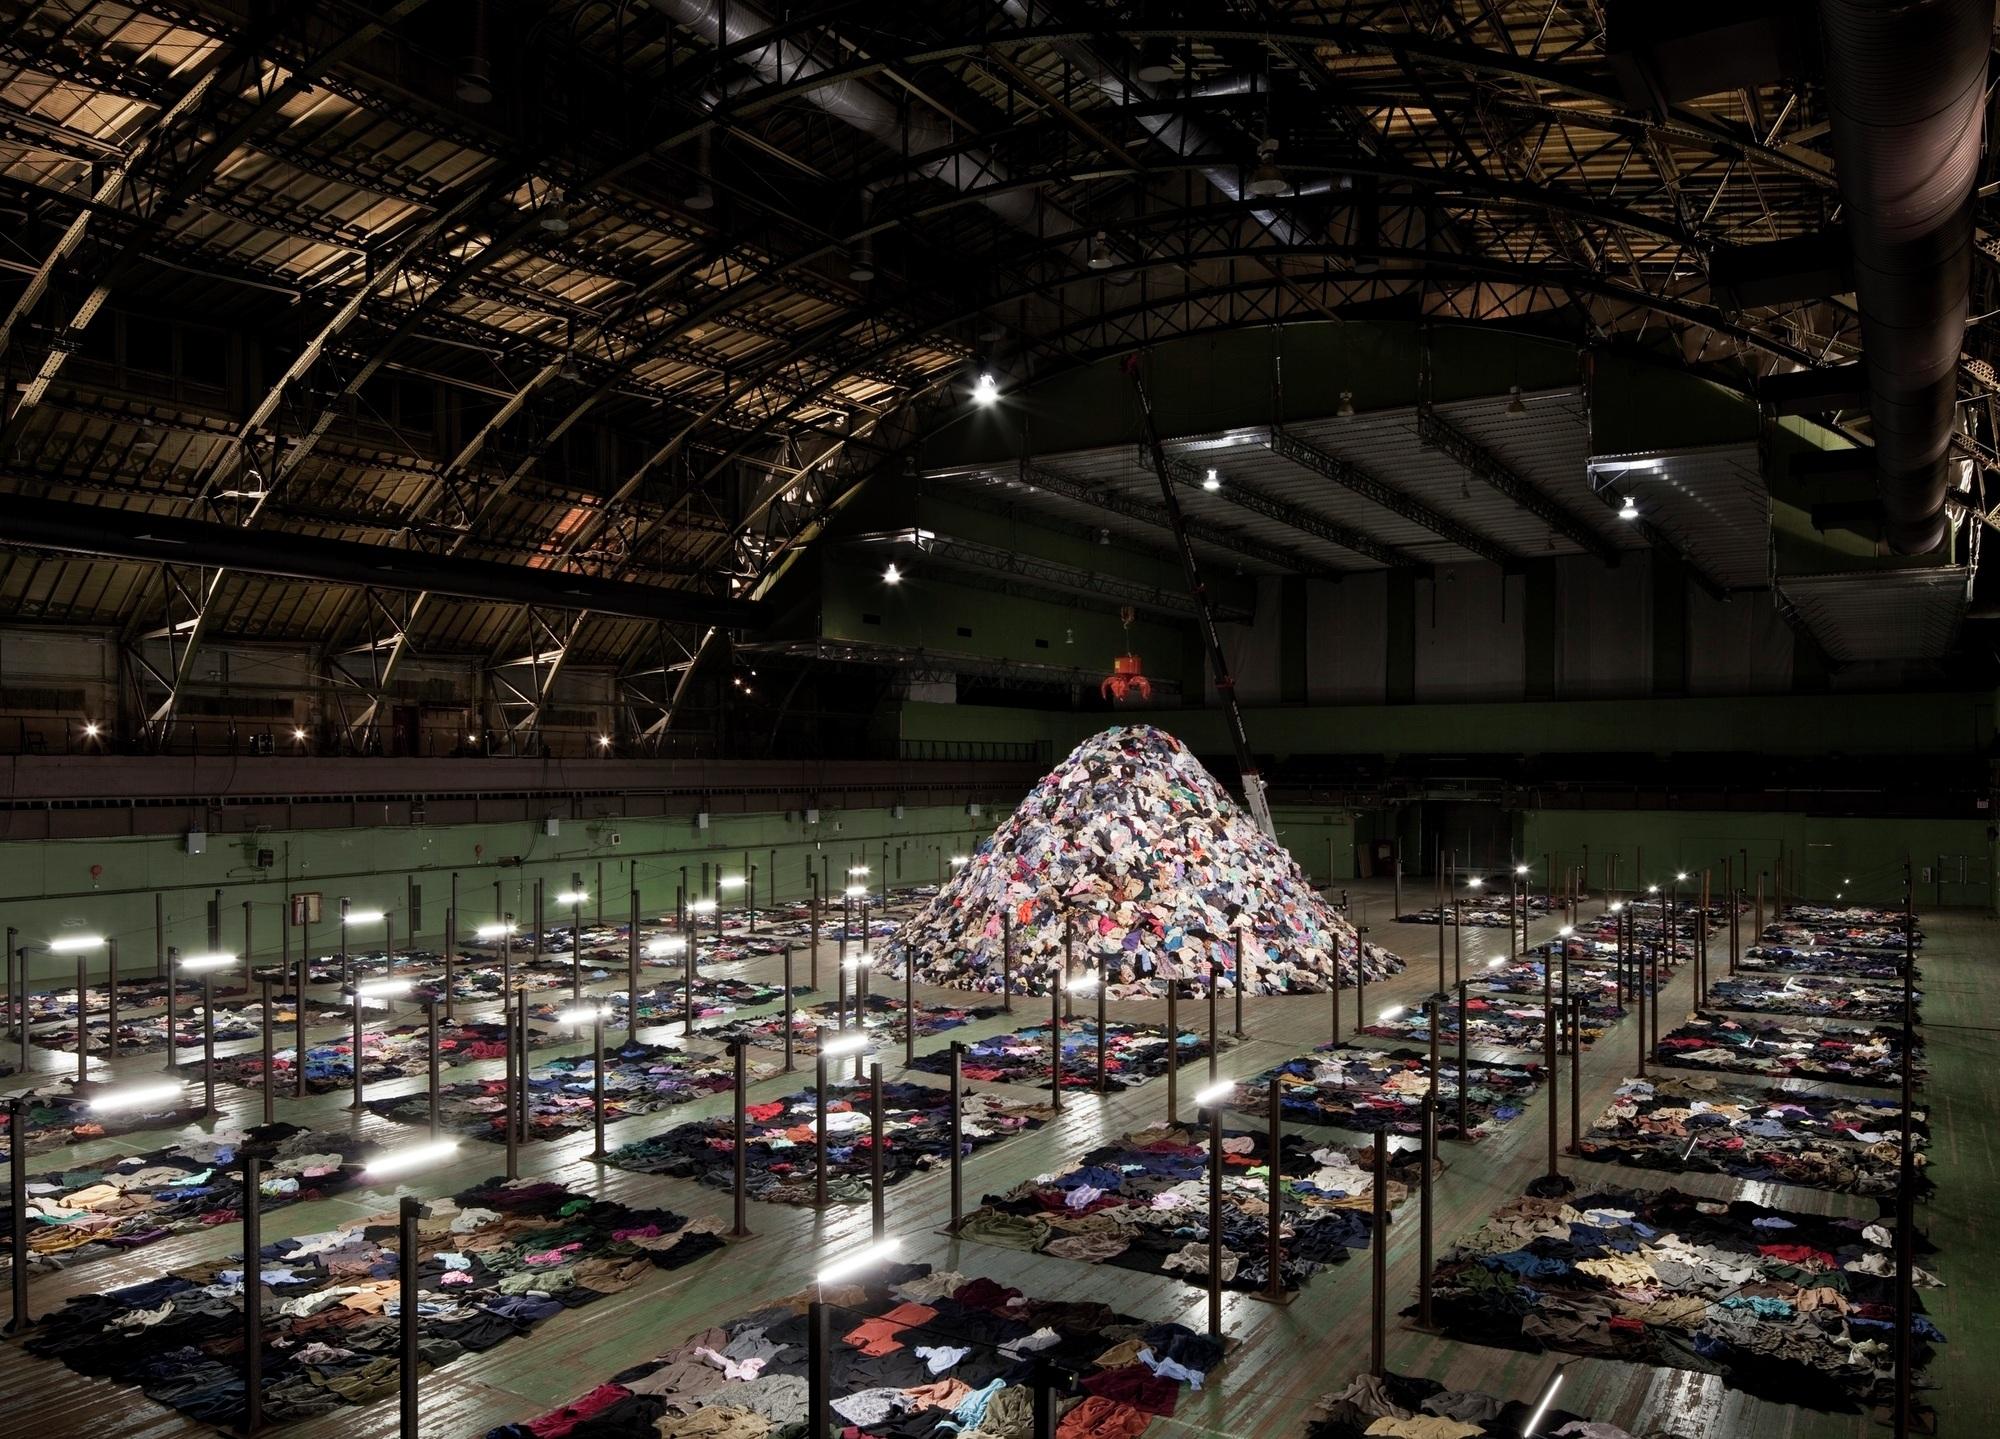 Gallery Of Park Avenue Armory Herzog Amp De Meuron